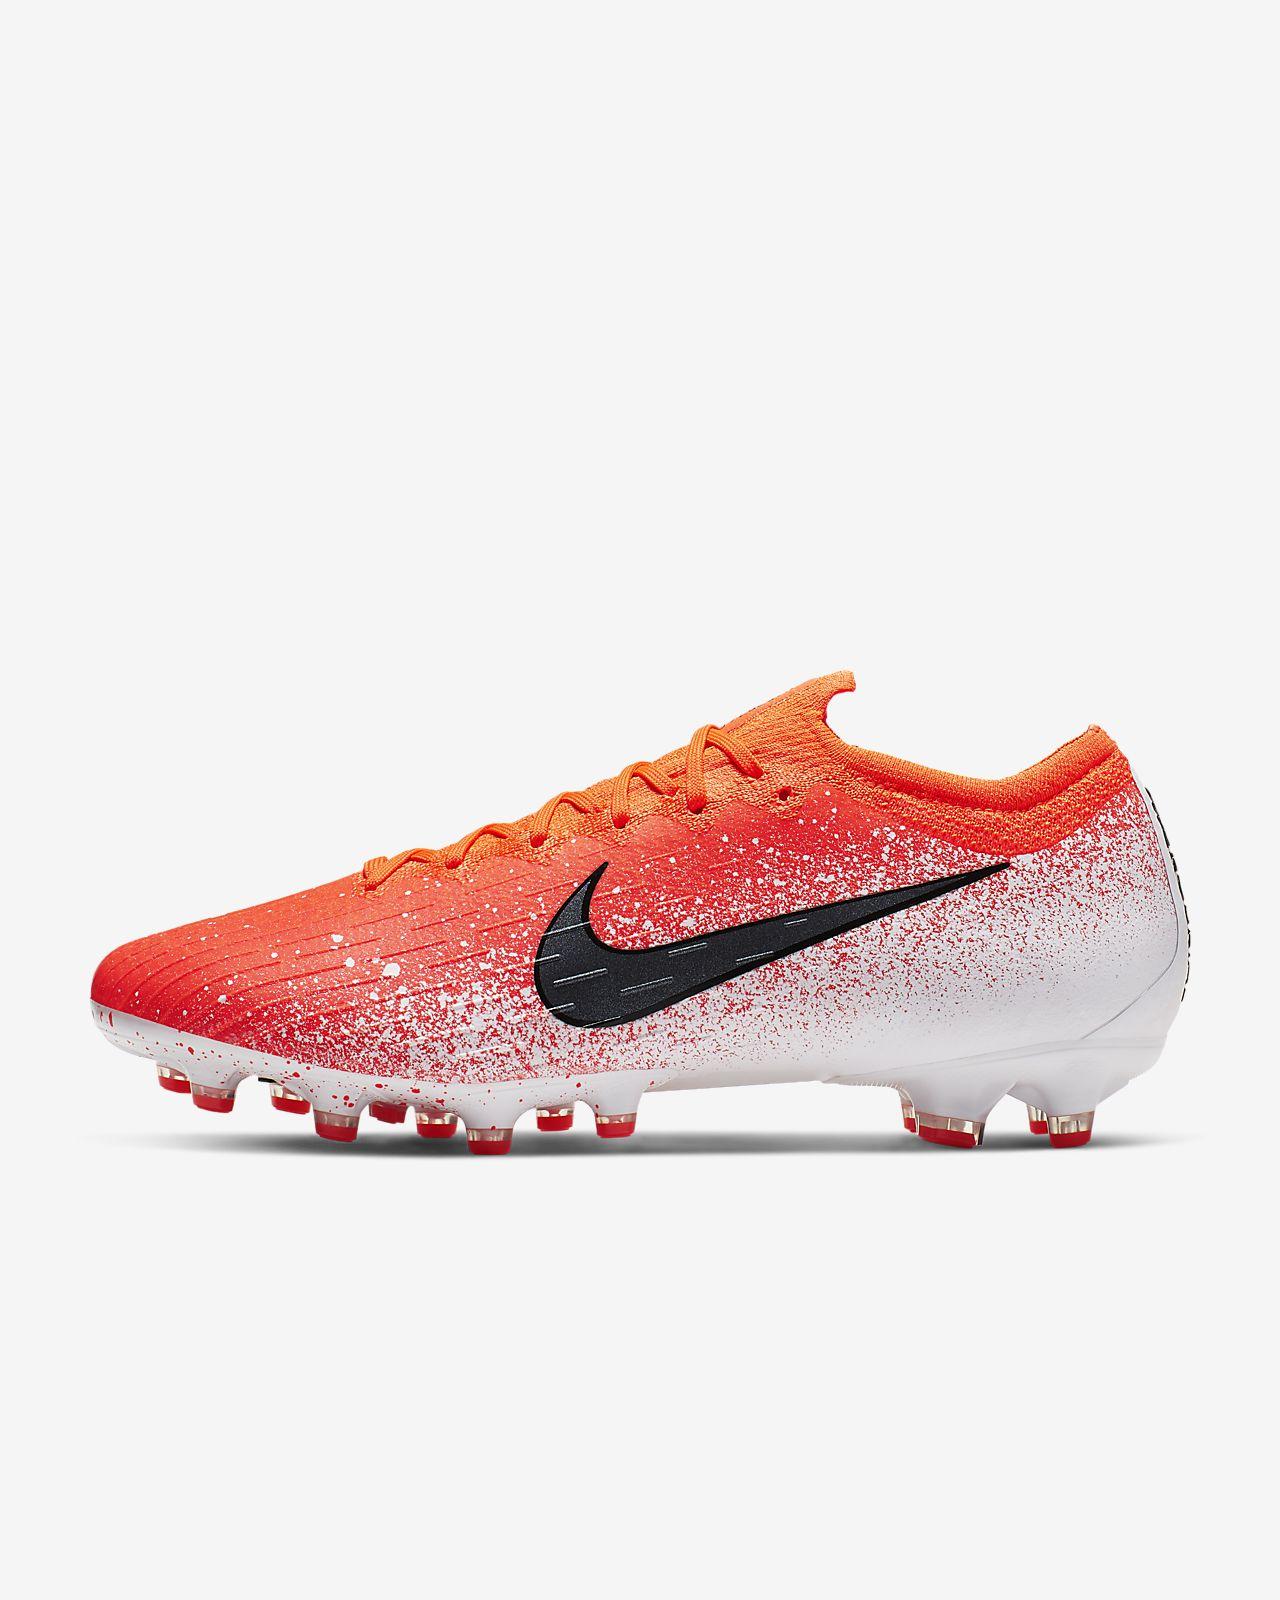 Nike Mercurial Vapor 360 Elite AG-PRO Botes de futbol per a gespa artificial